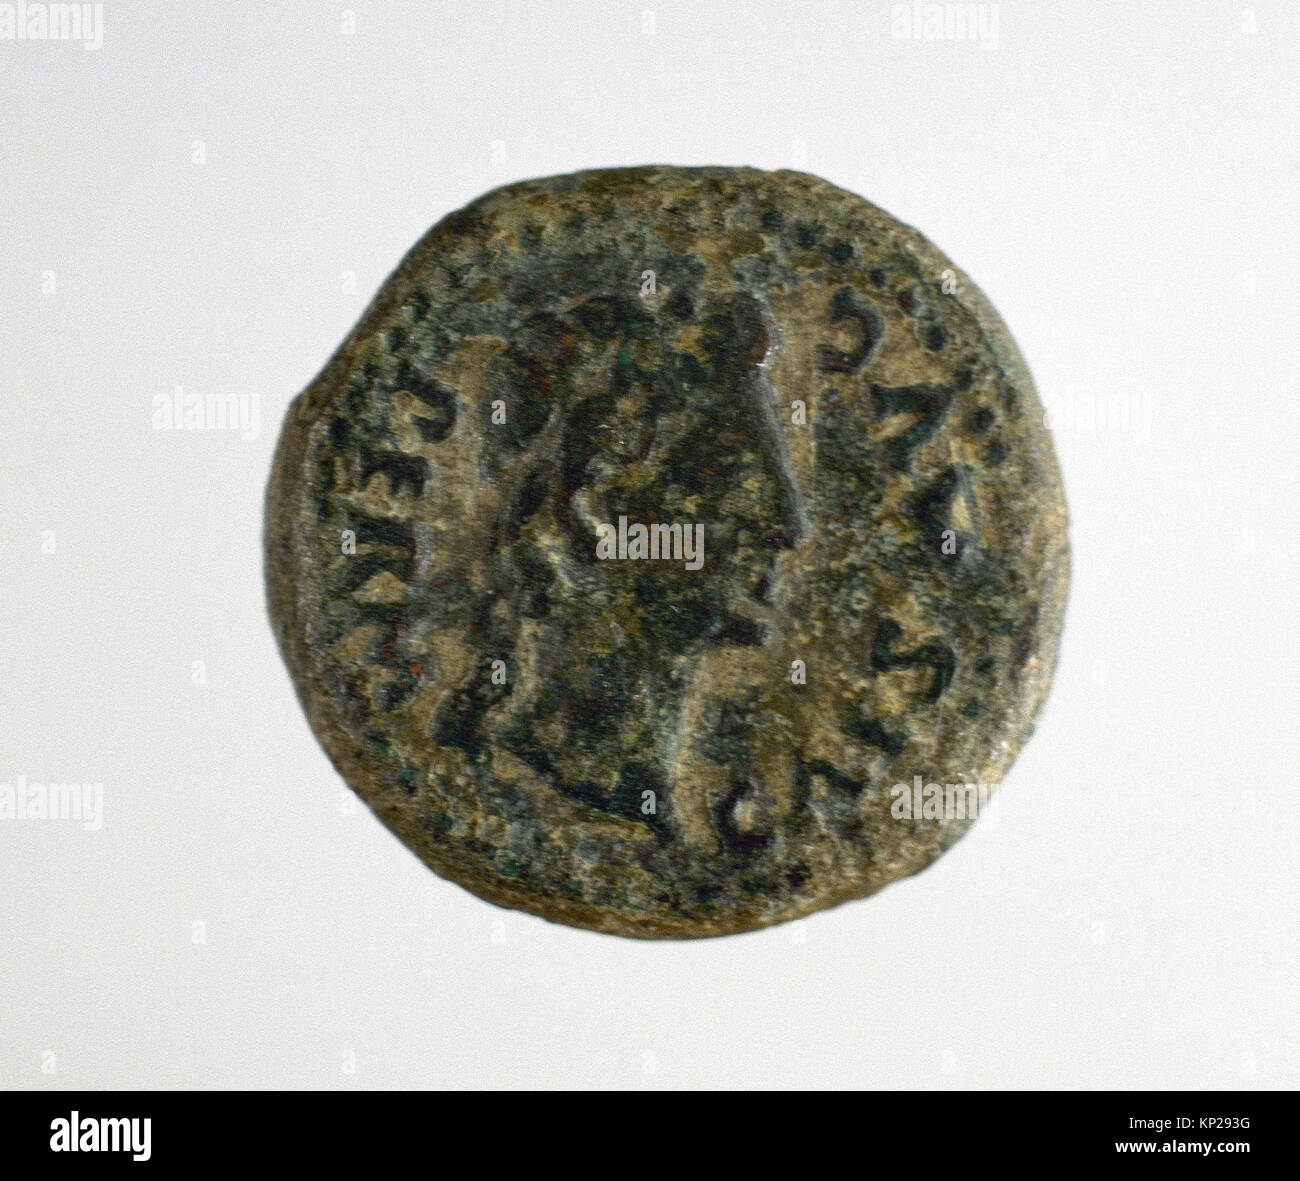 Semis. Bronze. Roman coin. Adverse. 'Pervissv caearis avgvsti'. 1st century. Mint of the colony Augusta - Stock Image